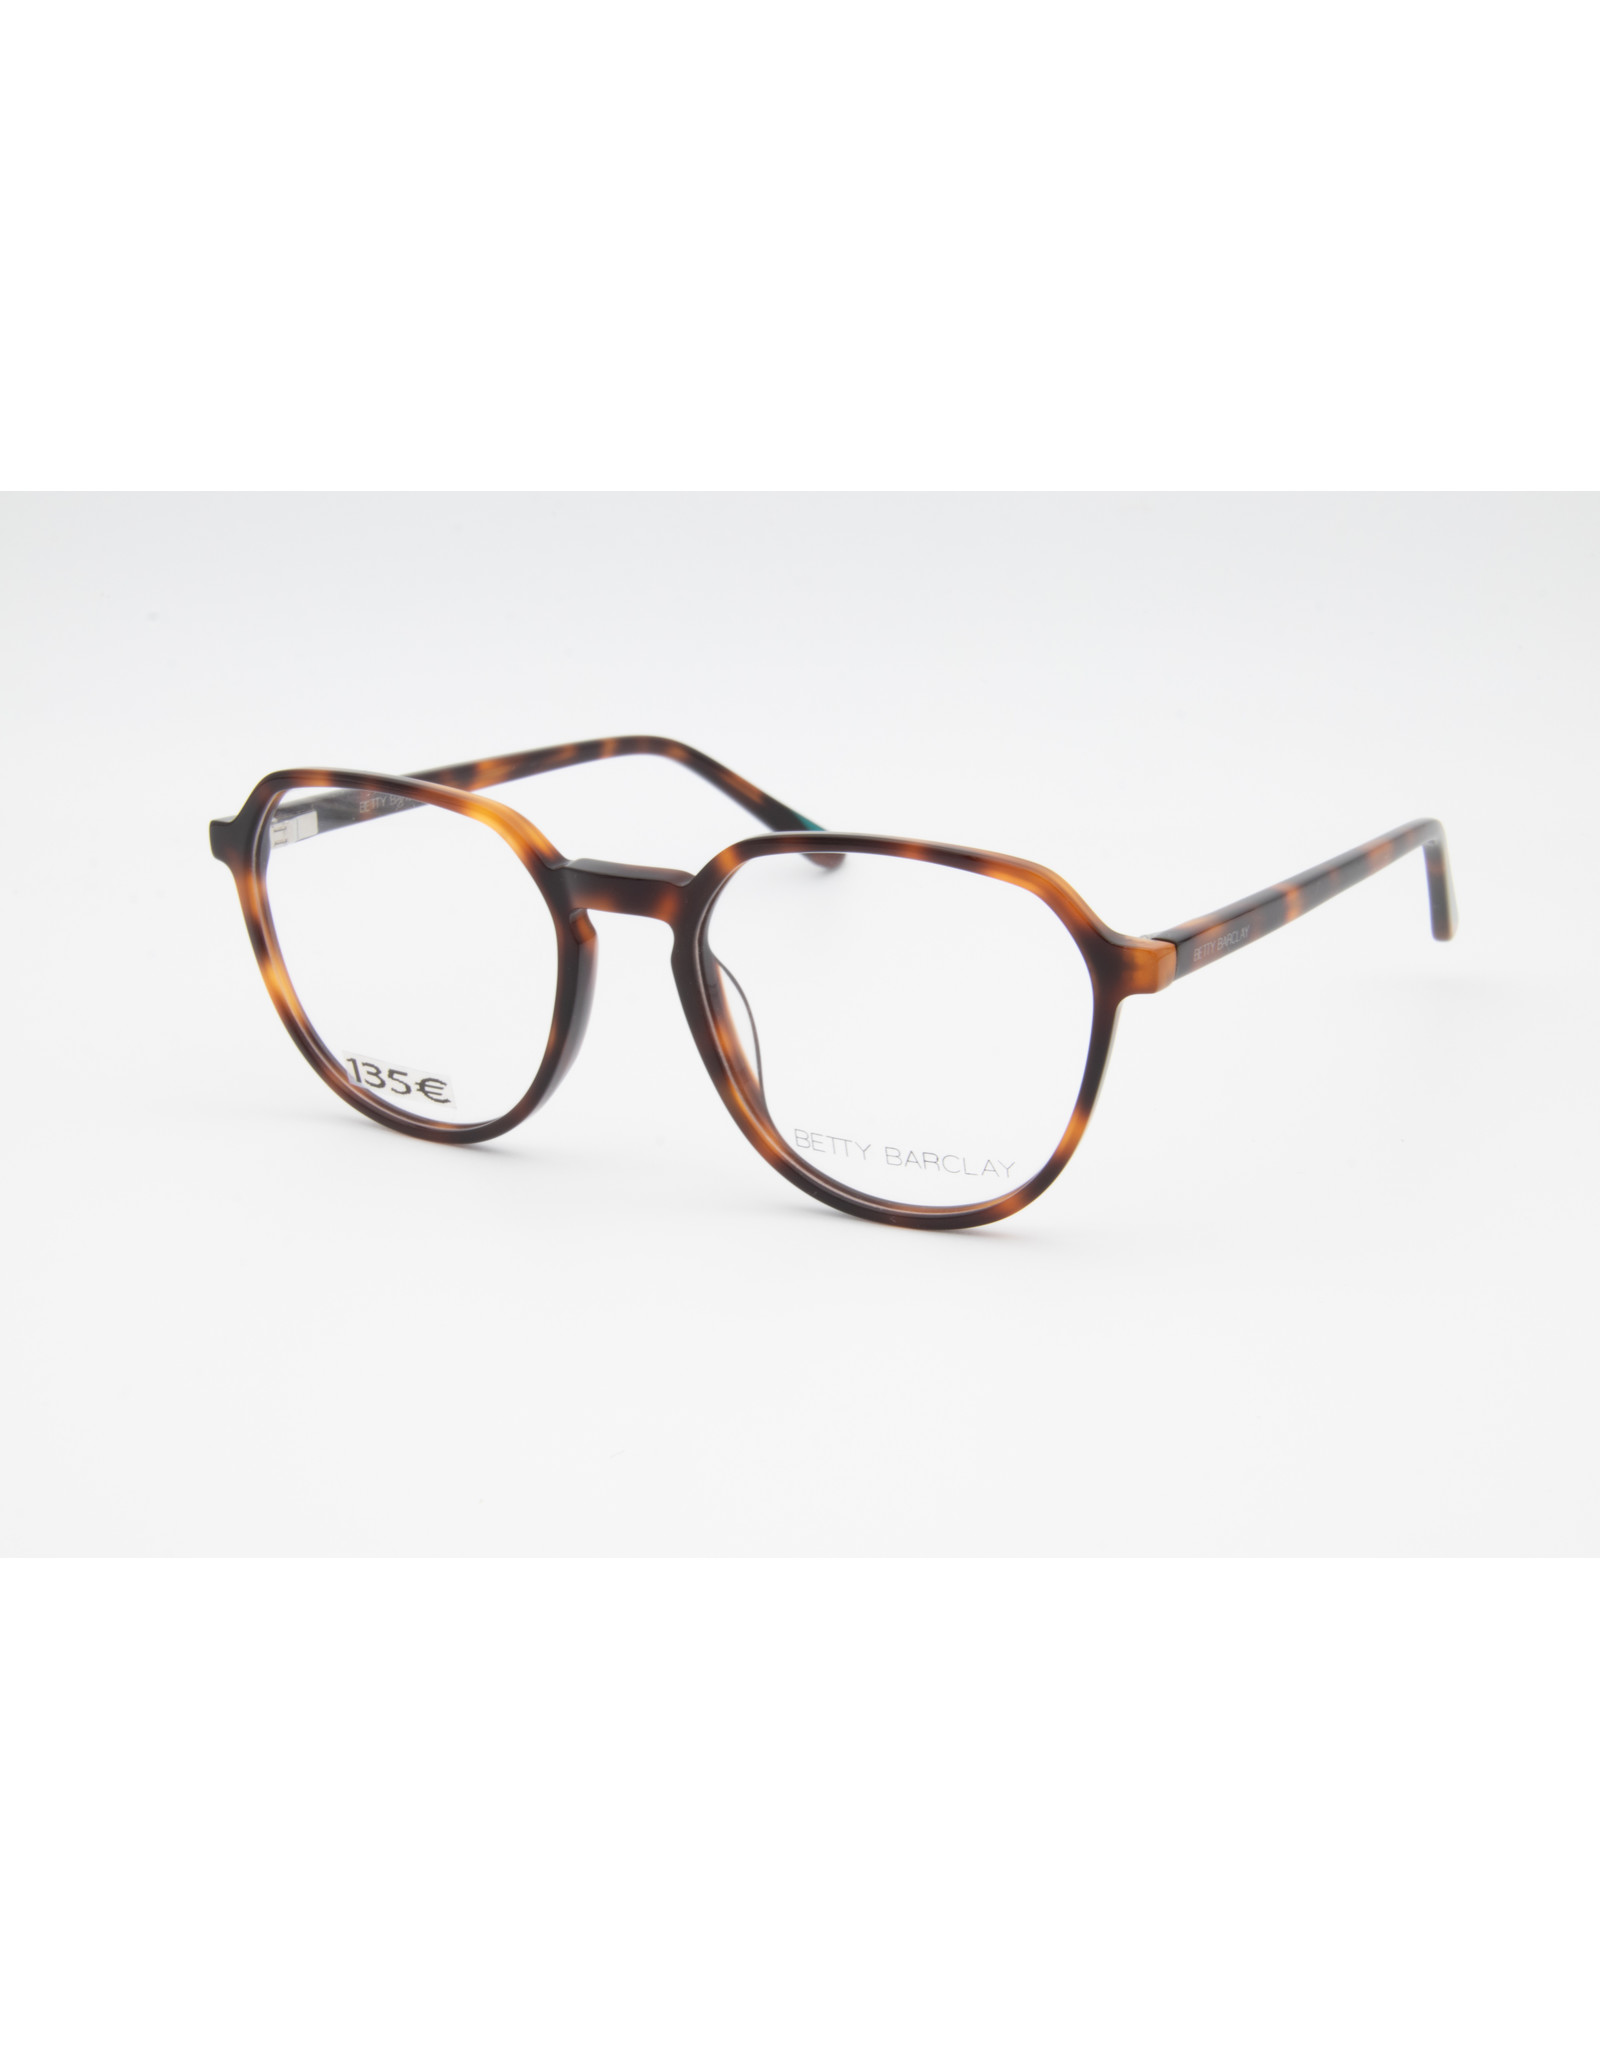 Betty Barclay BB51165 659 (brown tortoise)